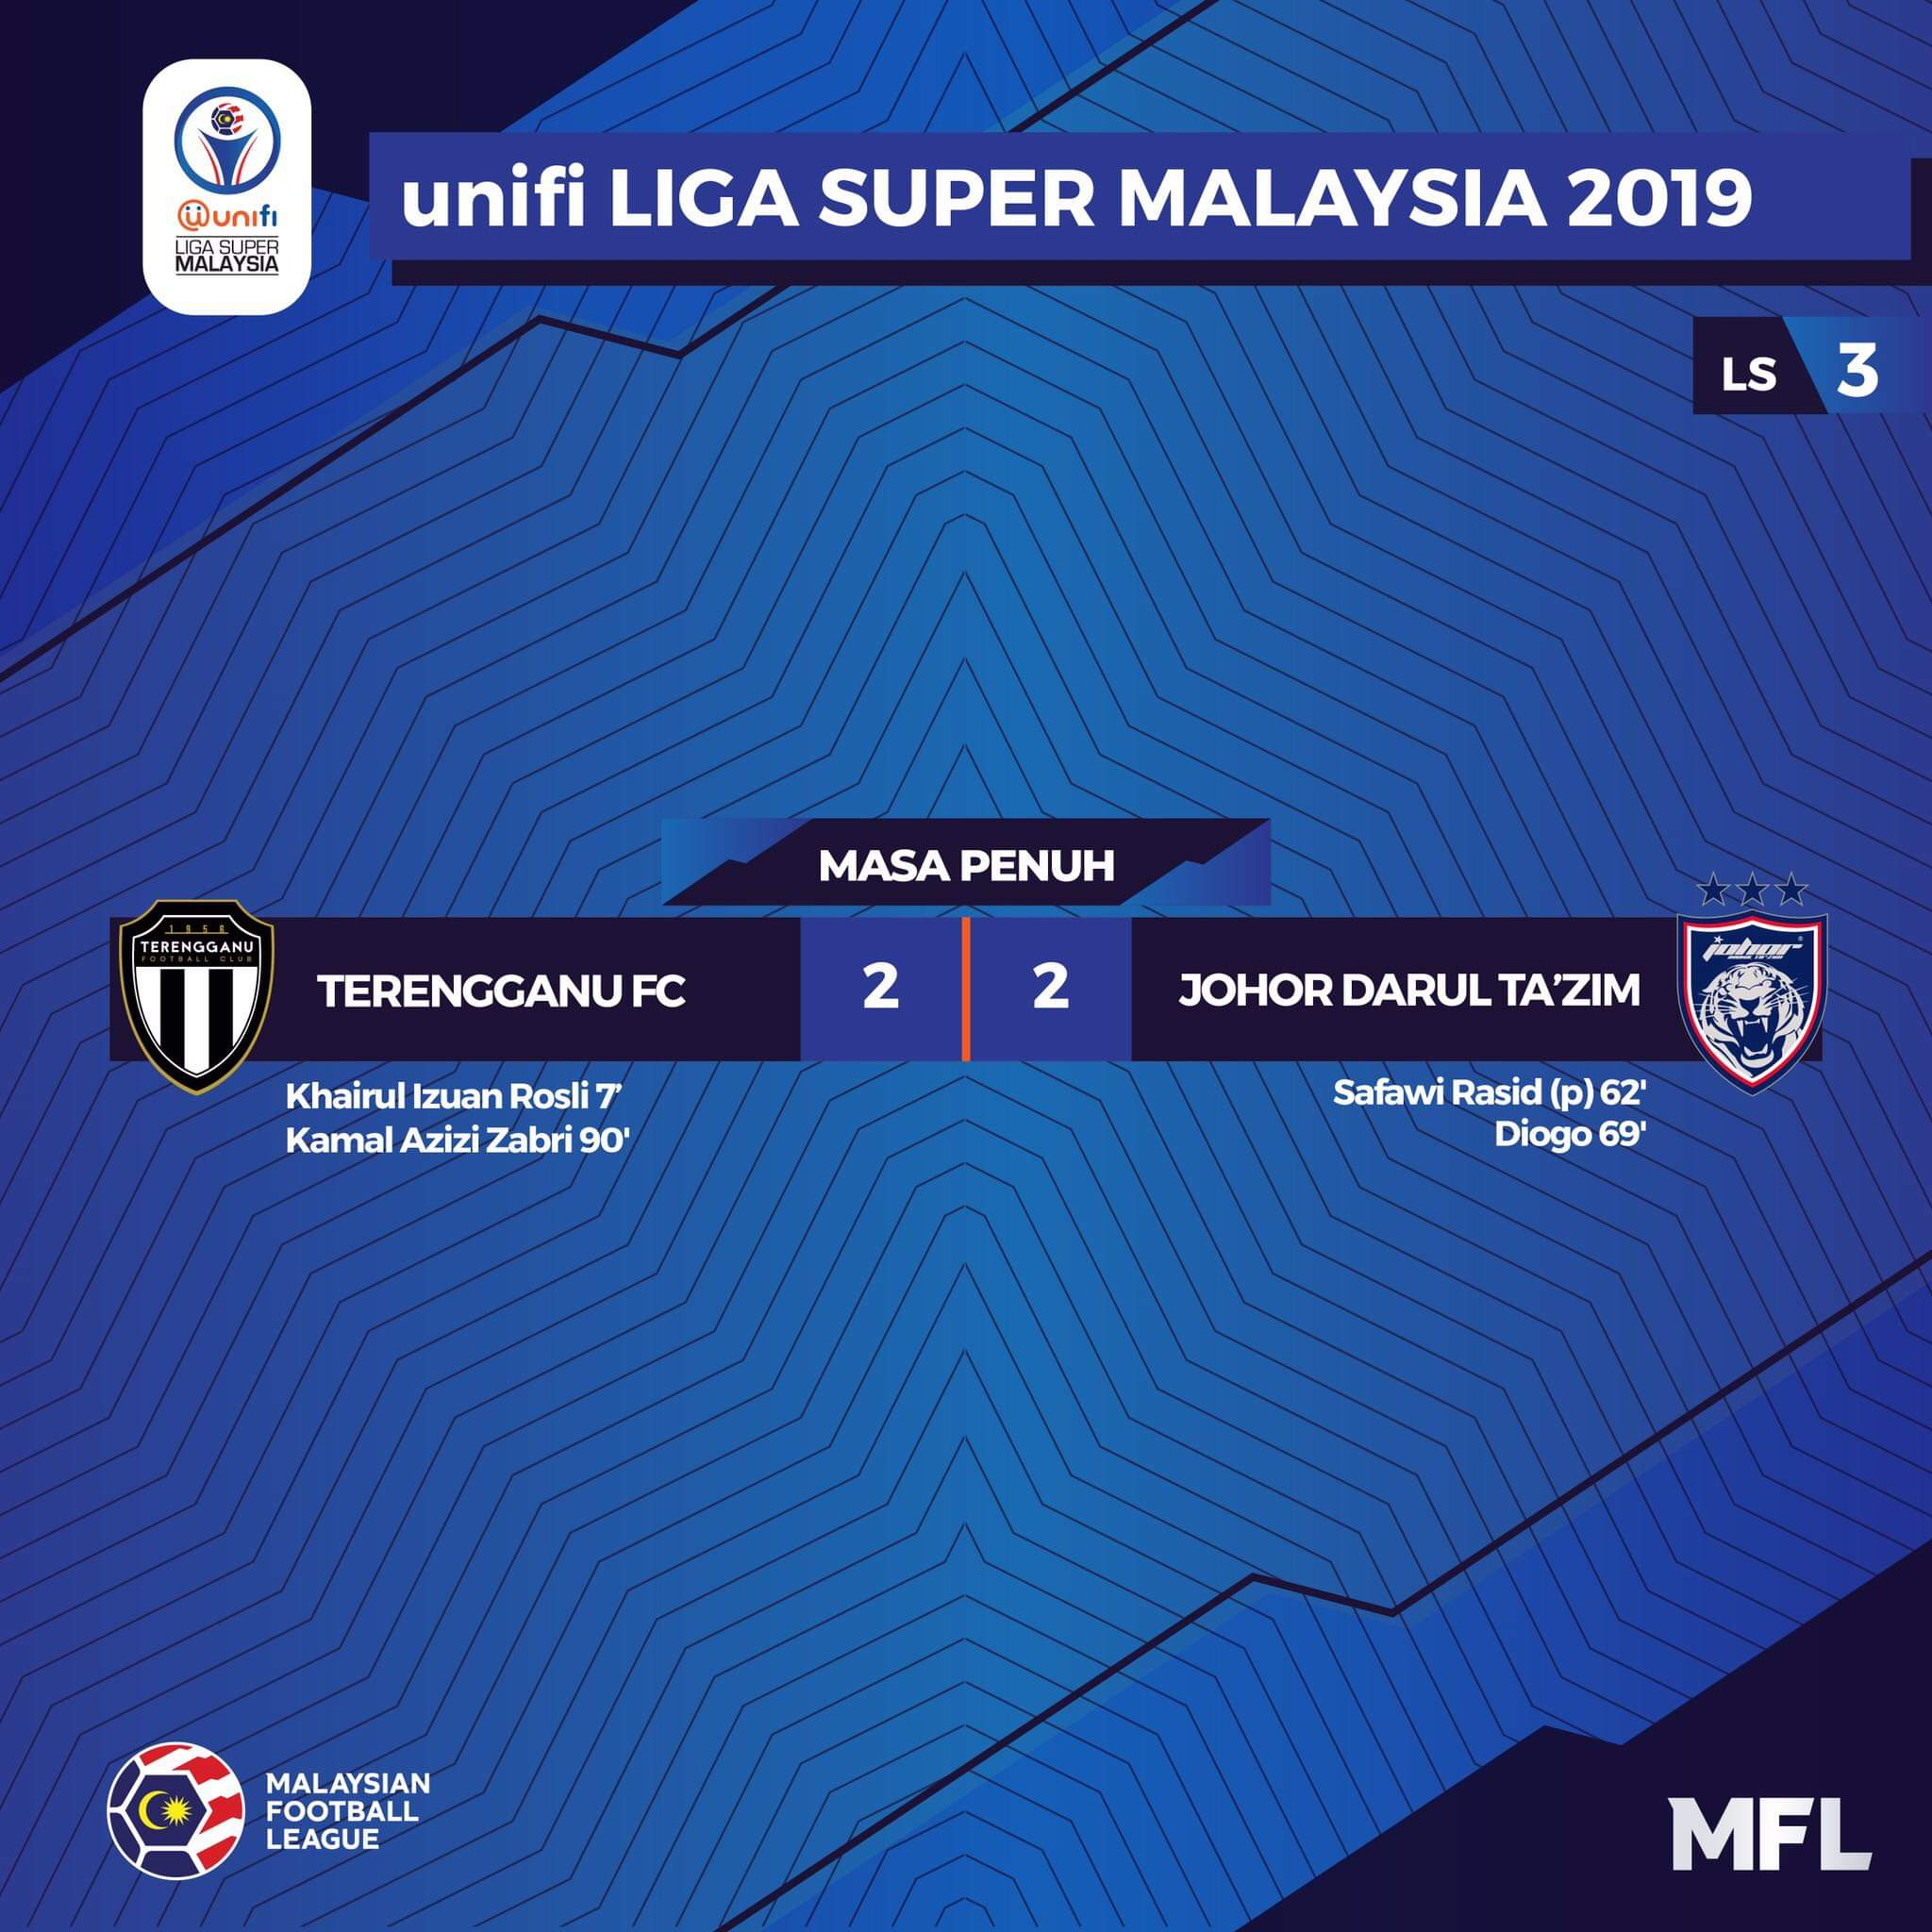 JDT Sekadar Seri 2-2 Dengan Terengganu FC, Sang Penyu Memberi Saingan Hebat!